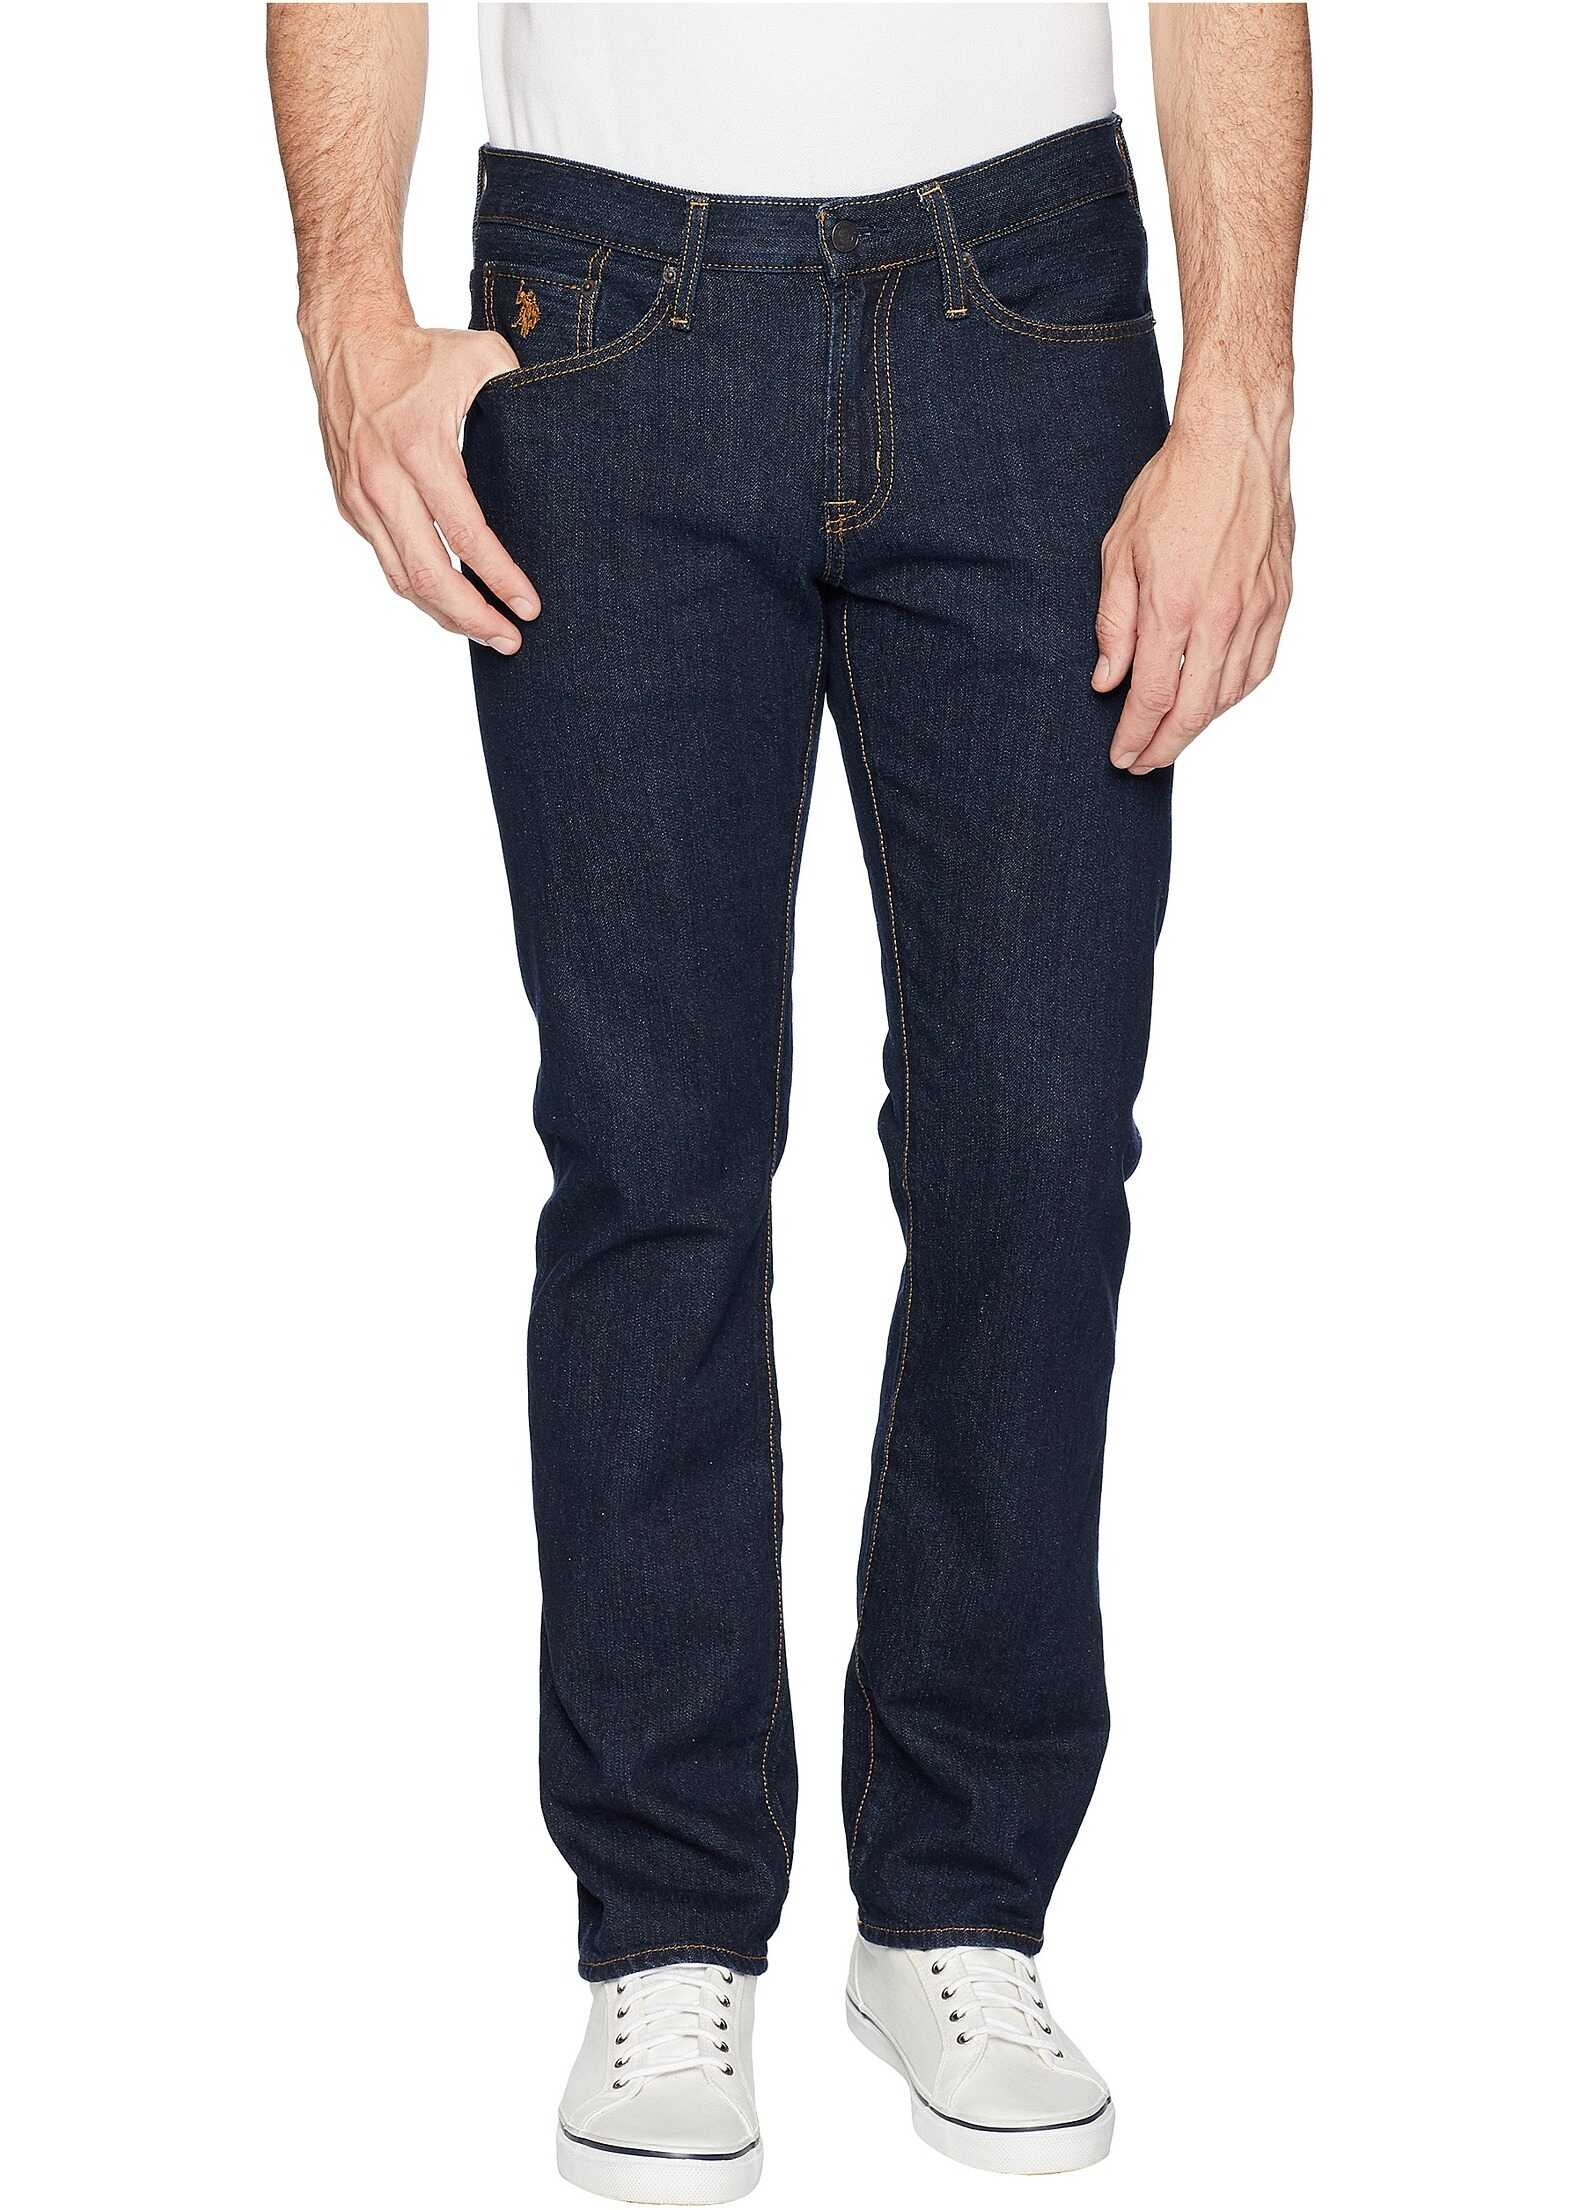 U.S. POLO ASSN. Slim Straight Five-Pocket Denim Jeans in Blue Blue